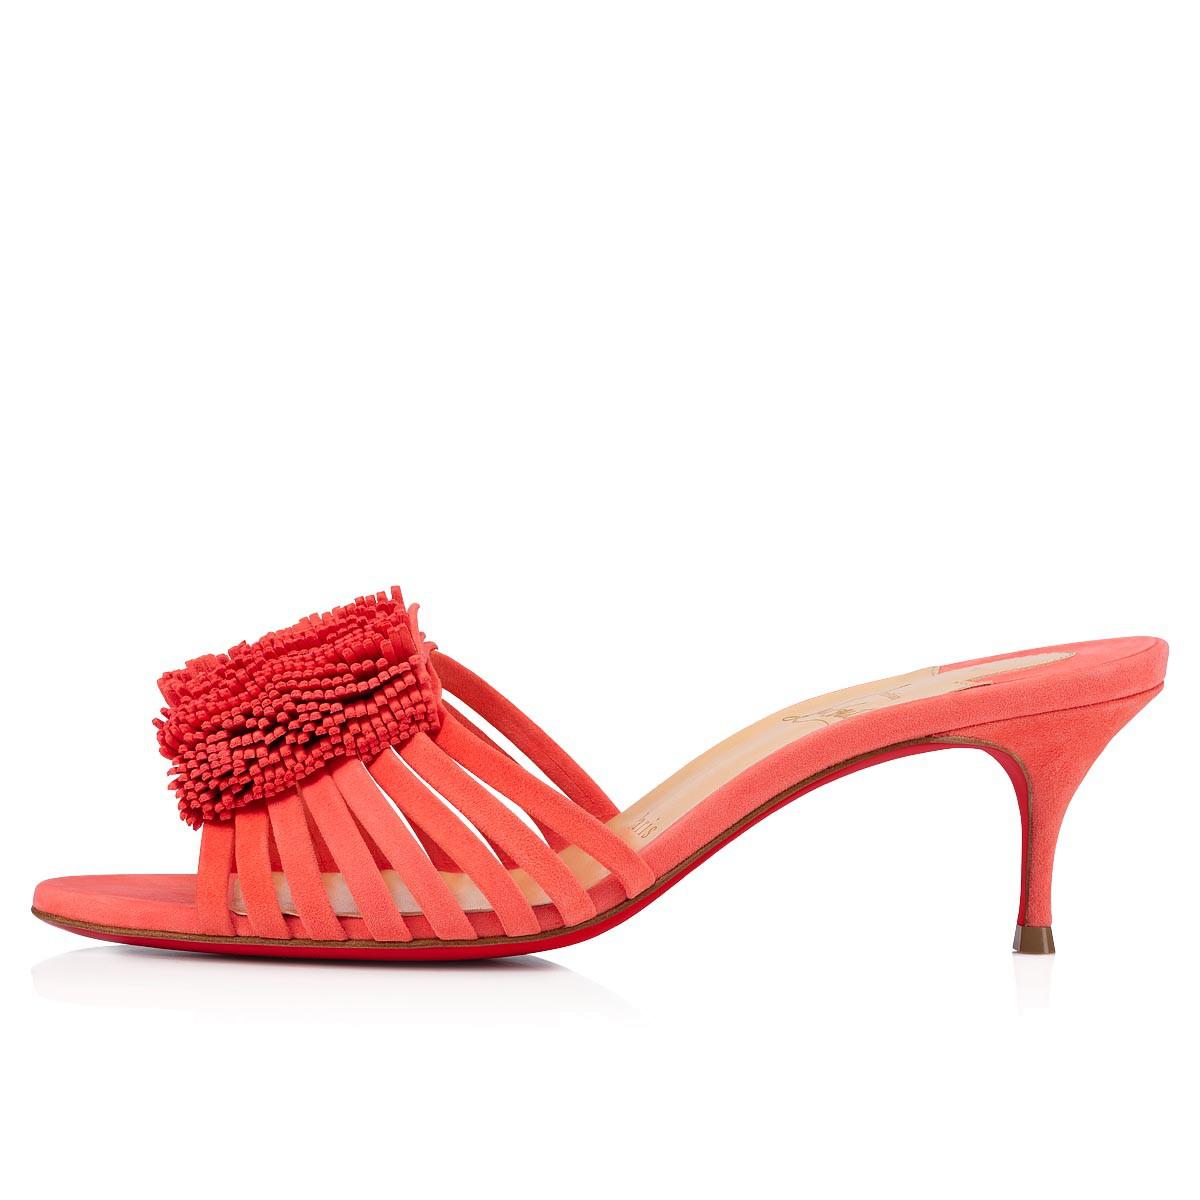 Shoes - Belbrossa - Christian Louboutin